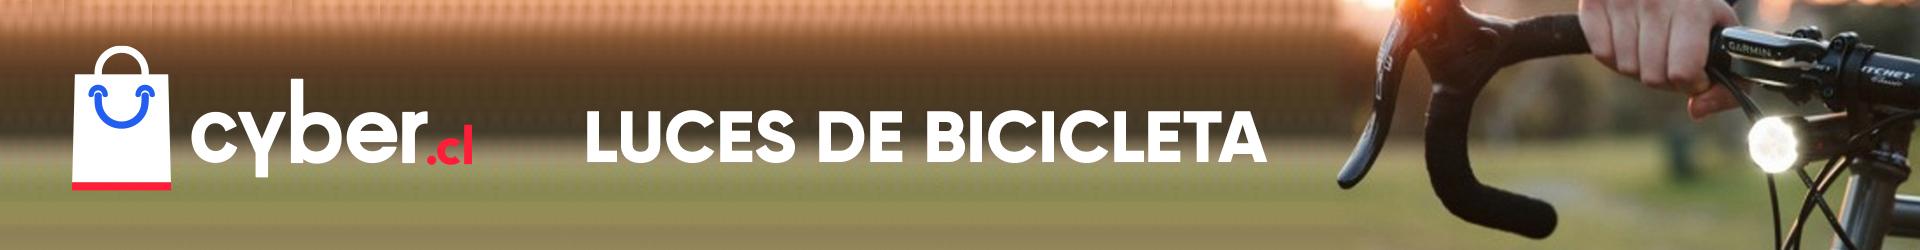 Ofertas Luces de Bicicleta